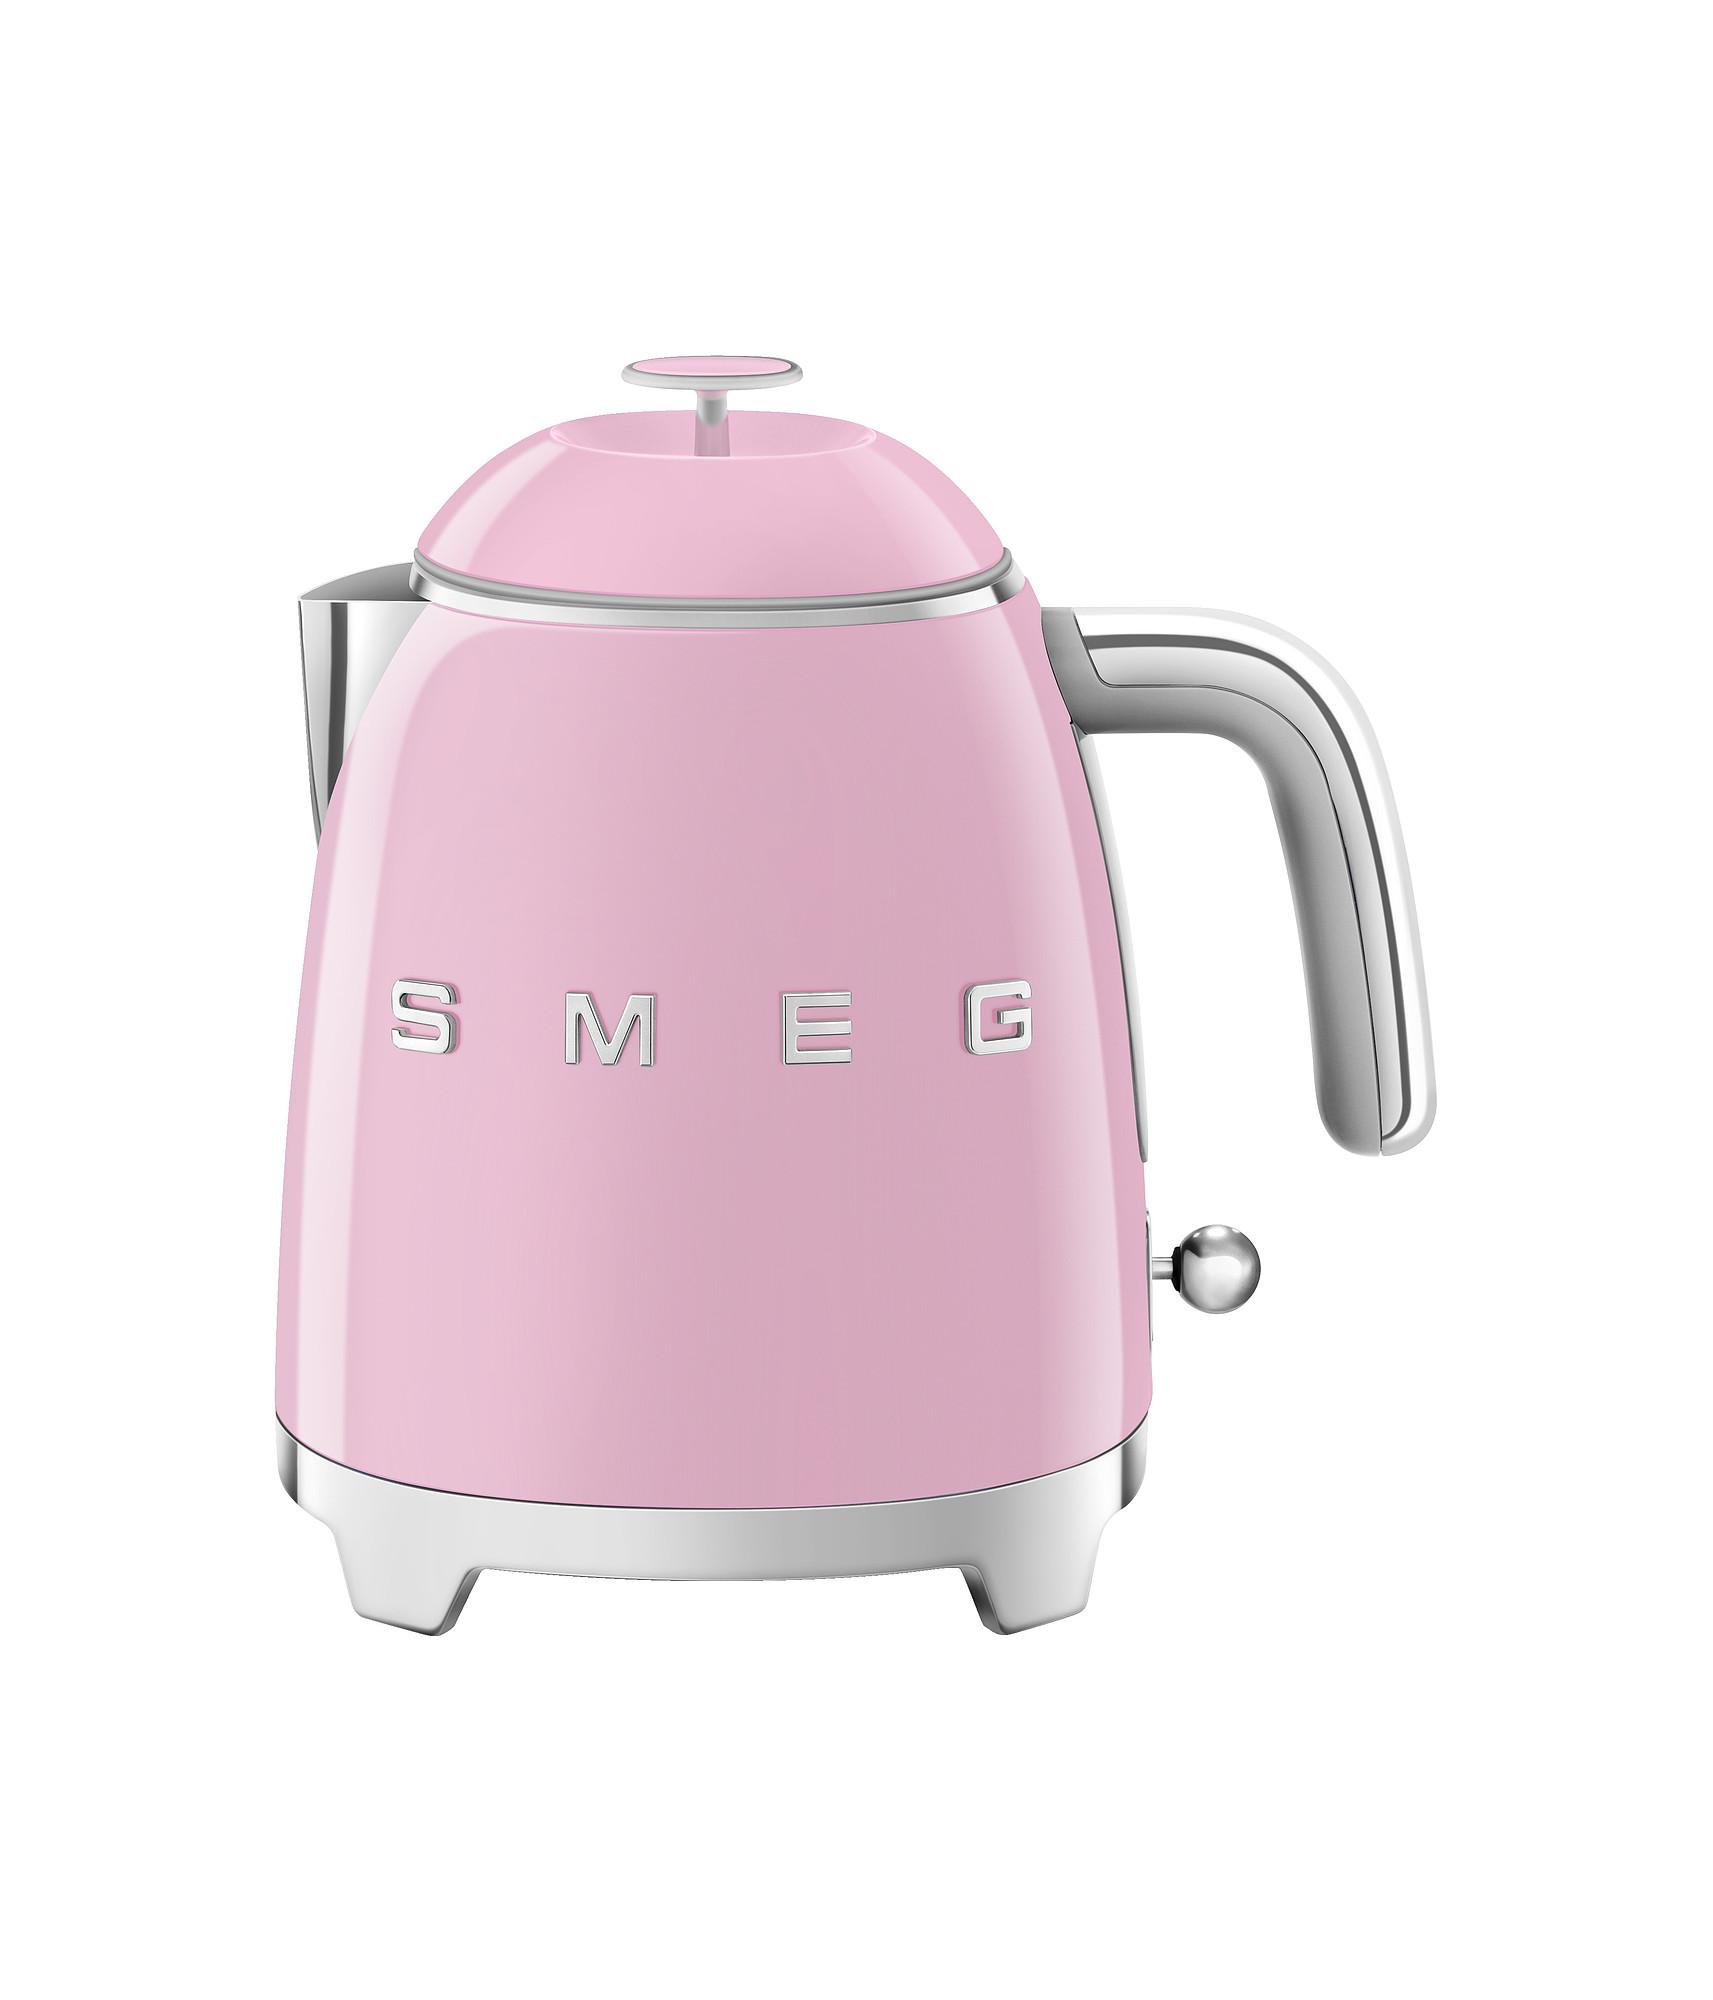 SMEG Mini Wasserkocher Cadillac Pink